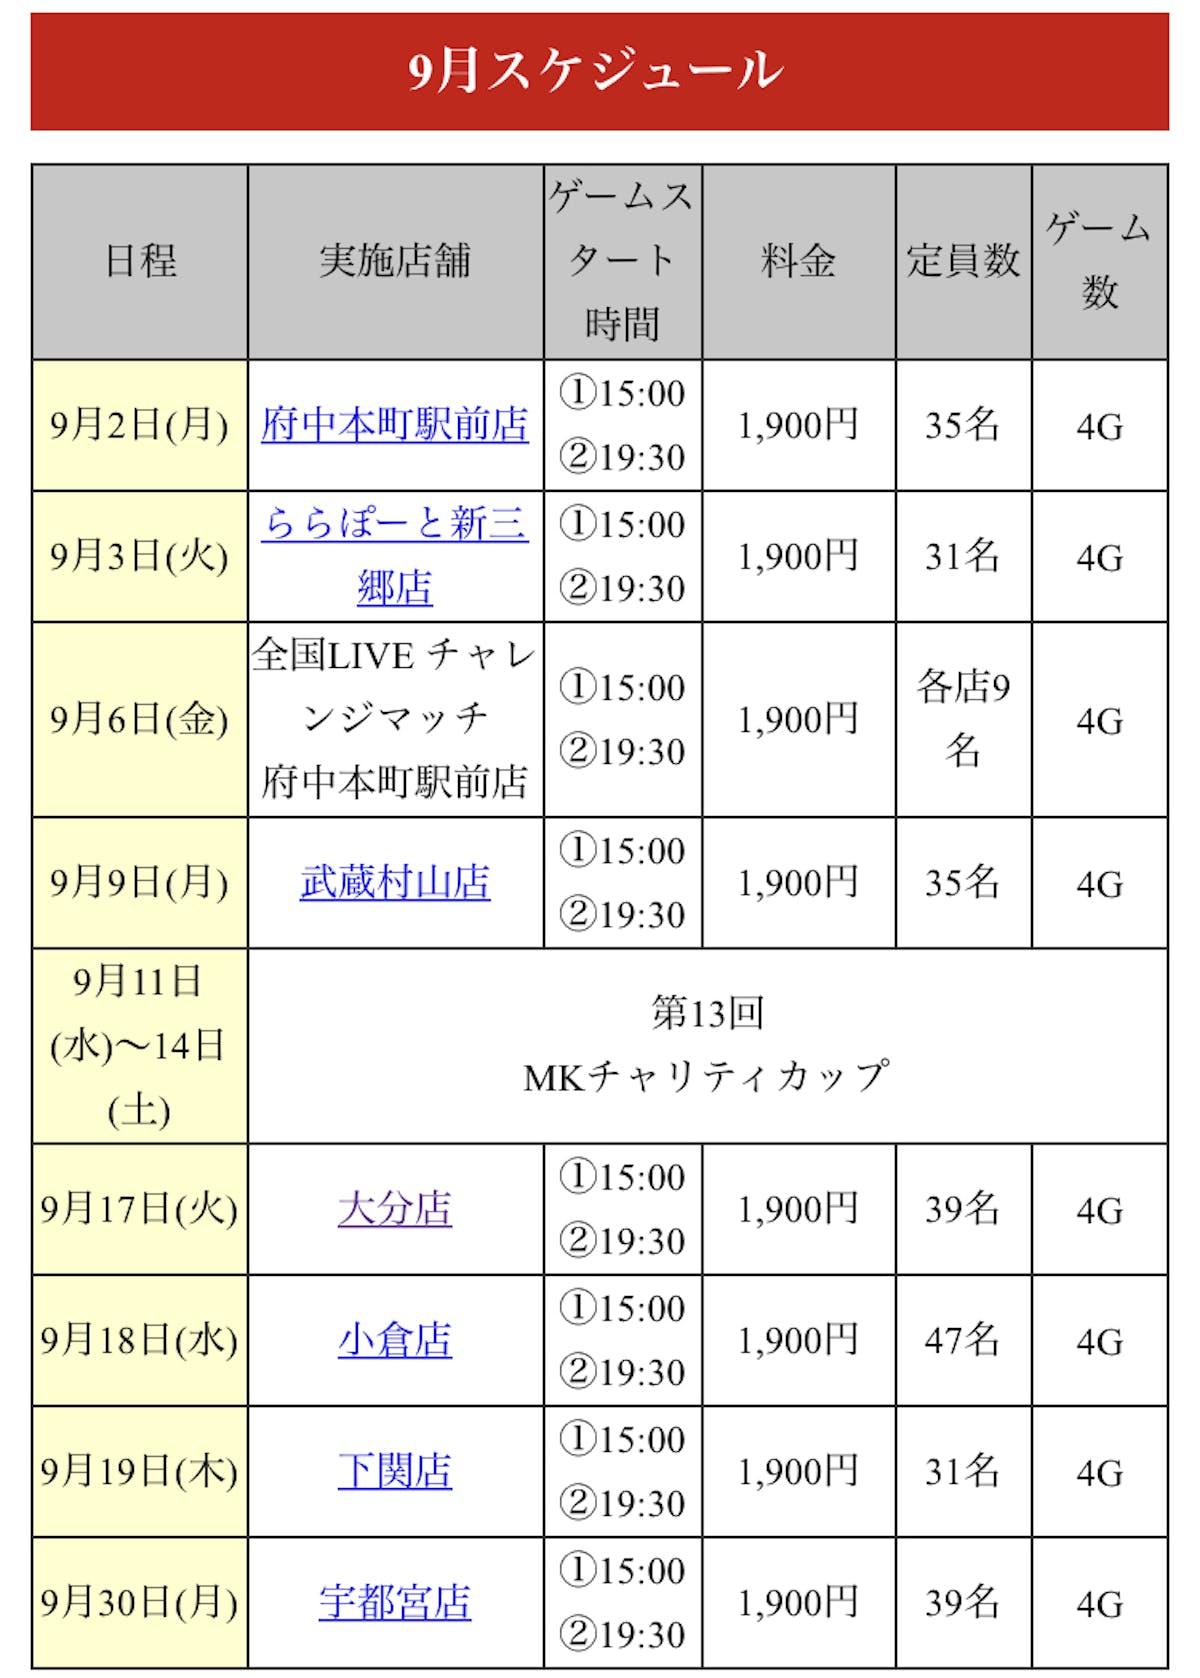 1067BB84-81E2-484F-A032-EC95C6556EB6.jpeg